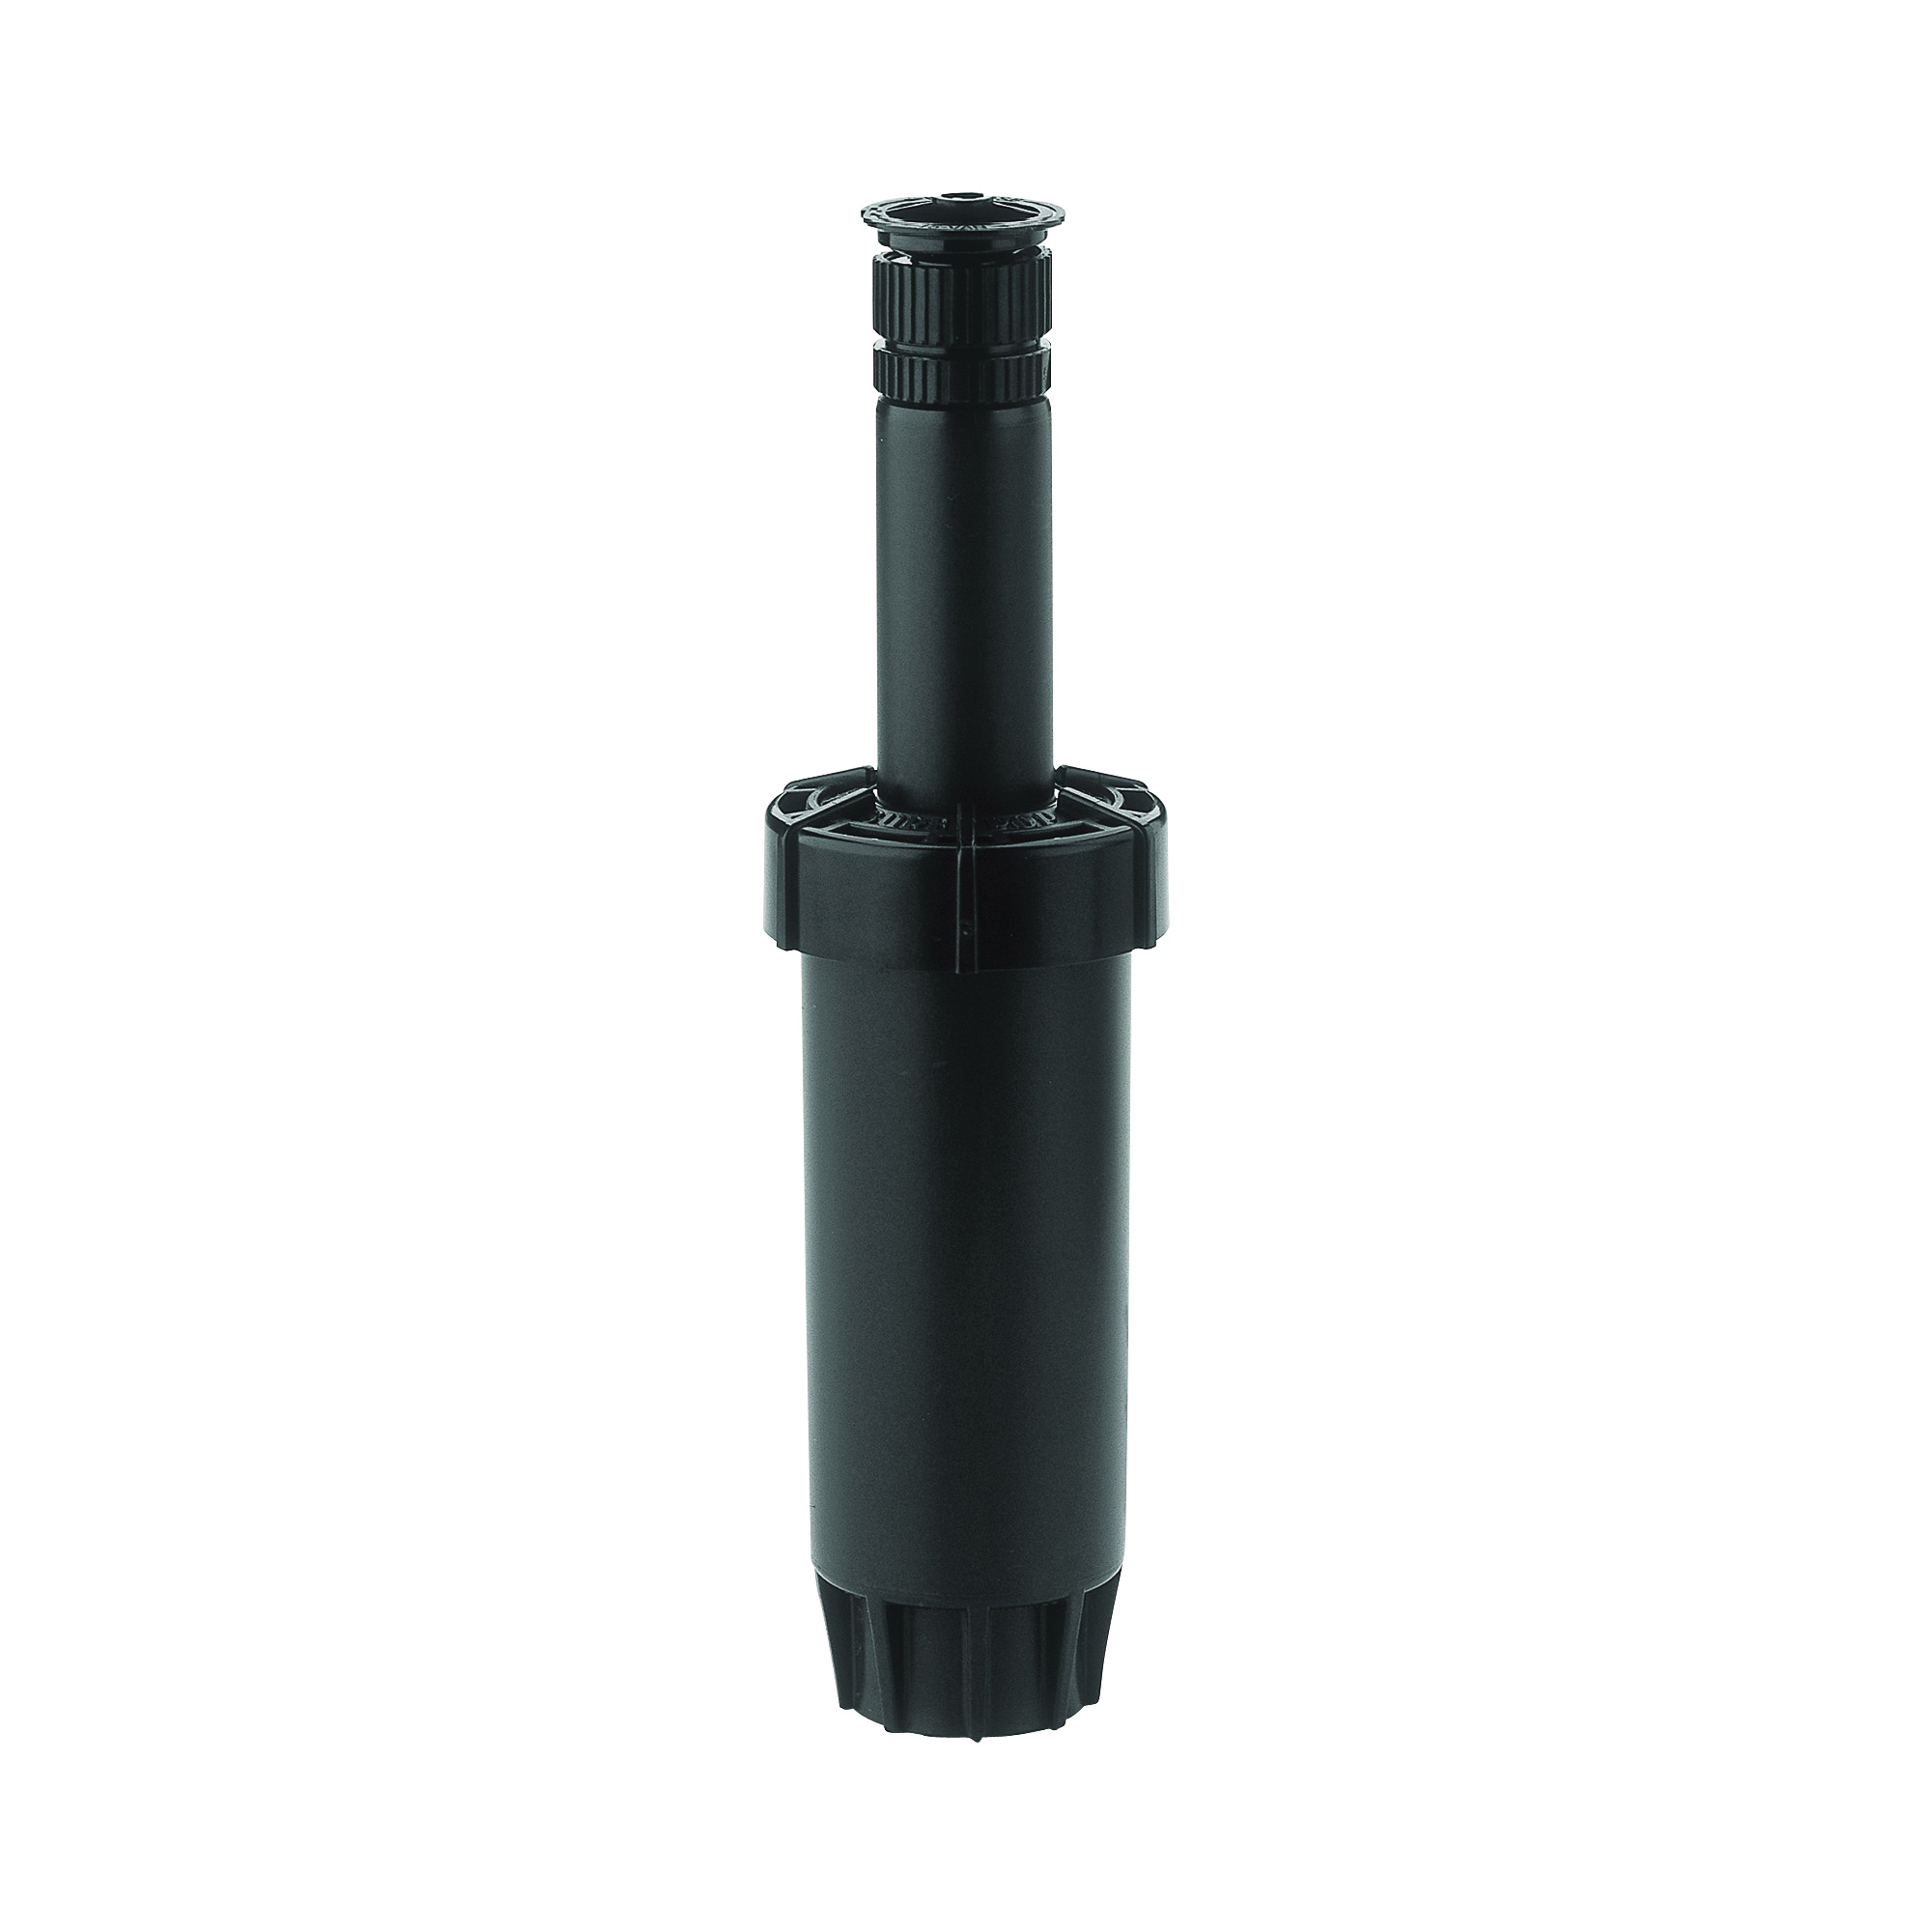 Picture of Rain Bird SP25QS Spray Head Sprinkler, 1/2 in Connection, FNPT, Plastic